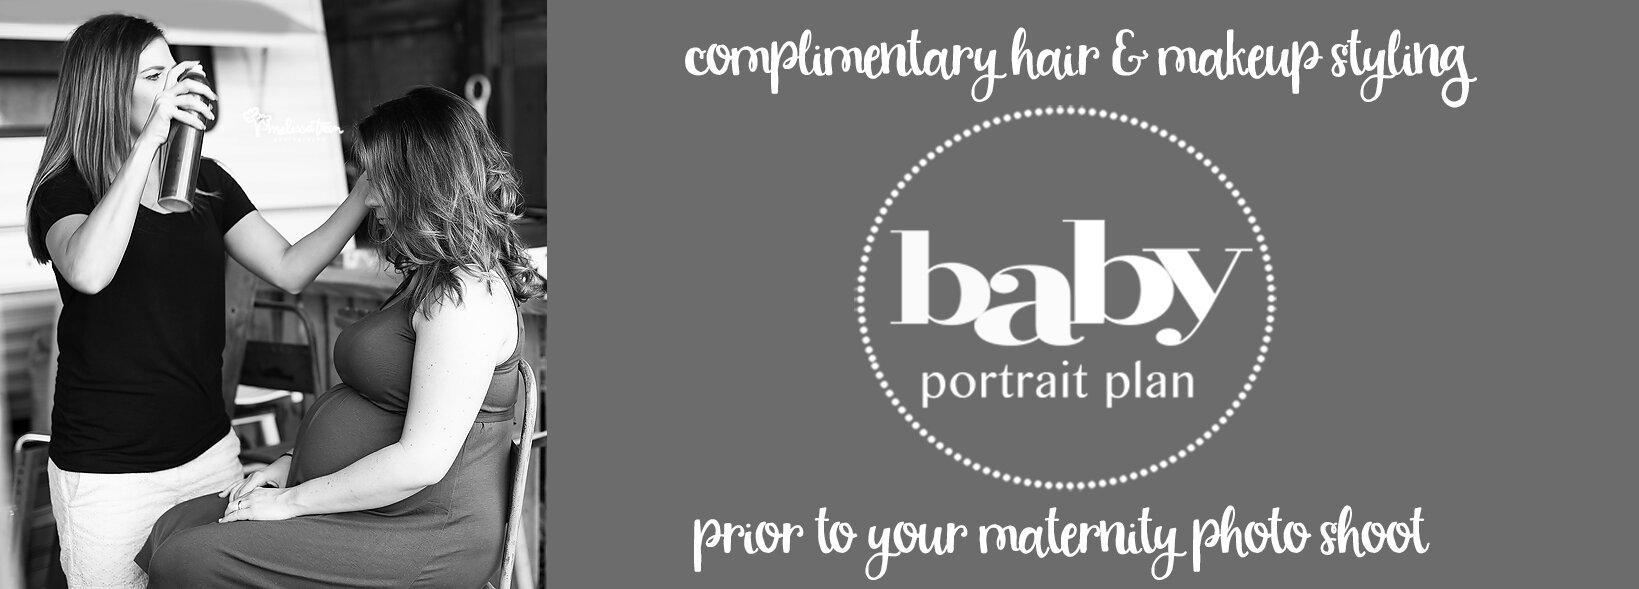 free hair and makeup greensboro photographer web .jpg